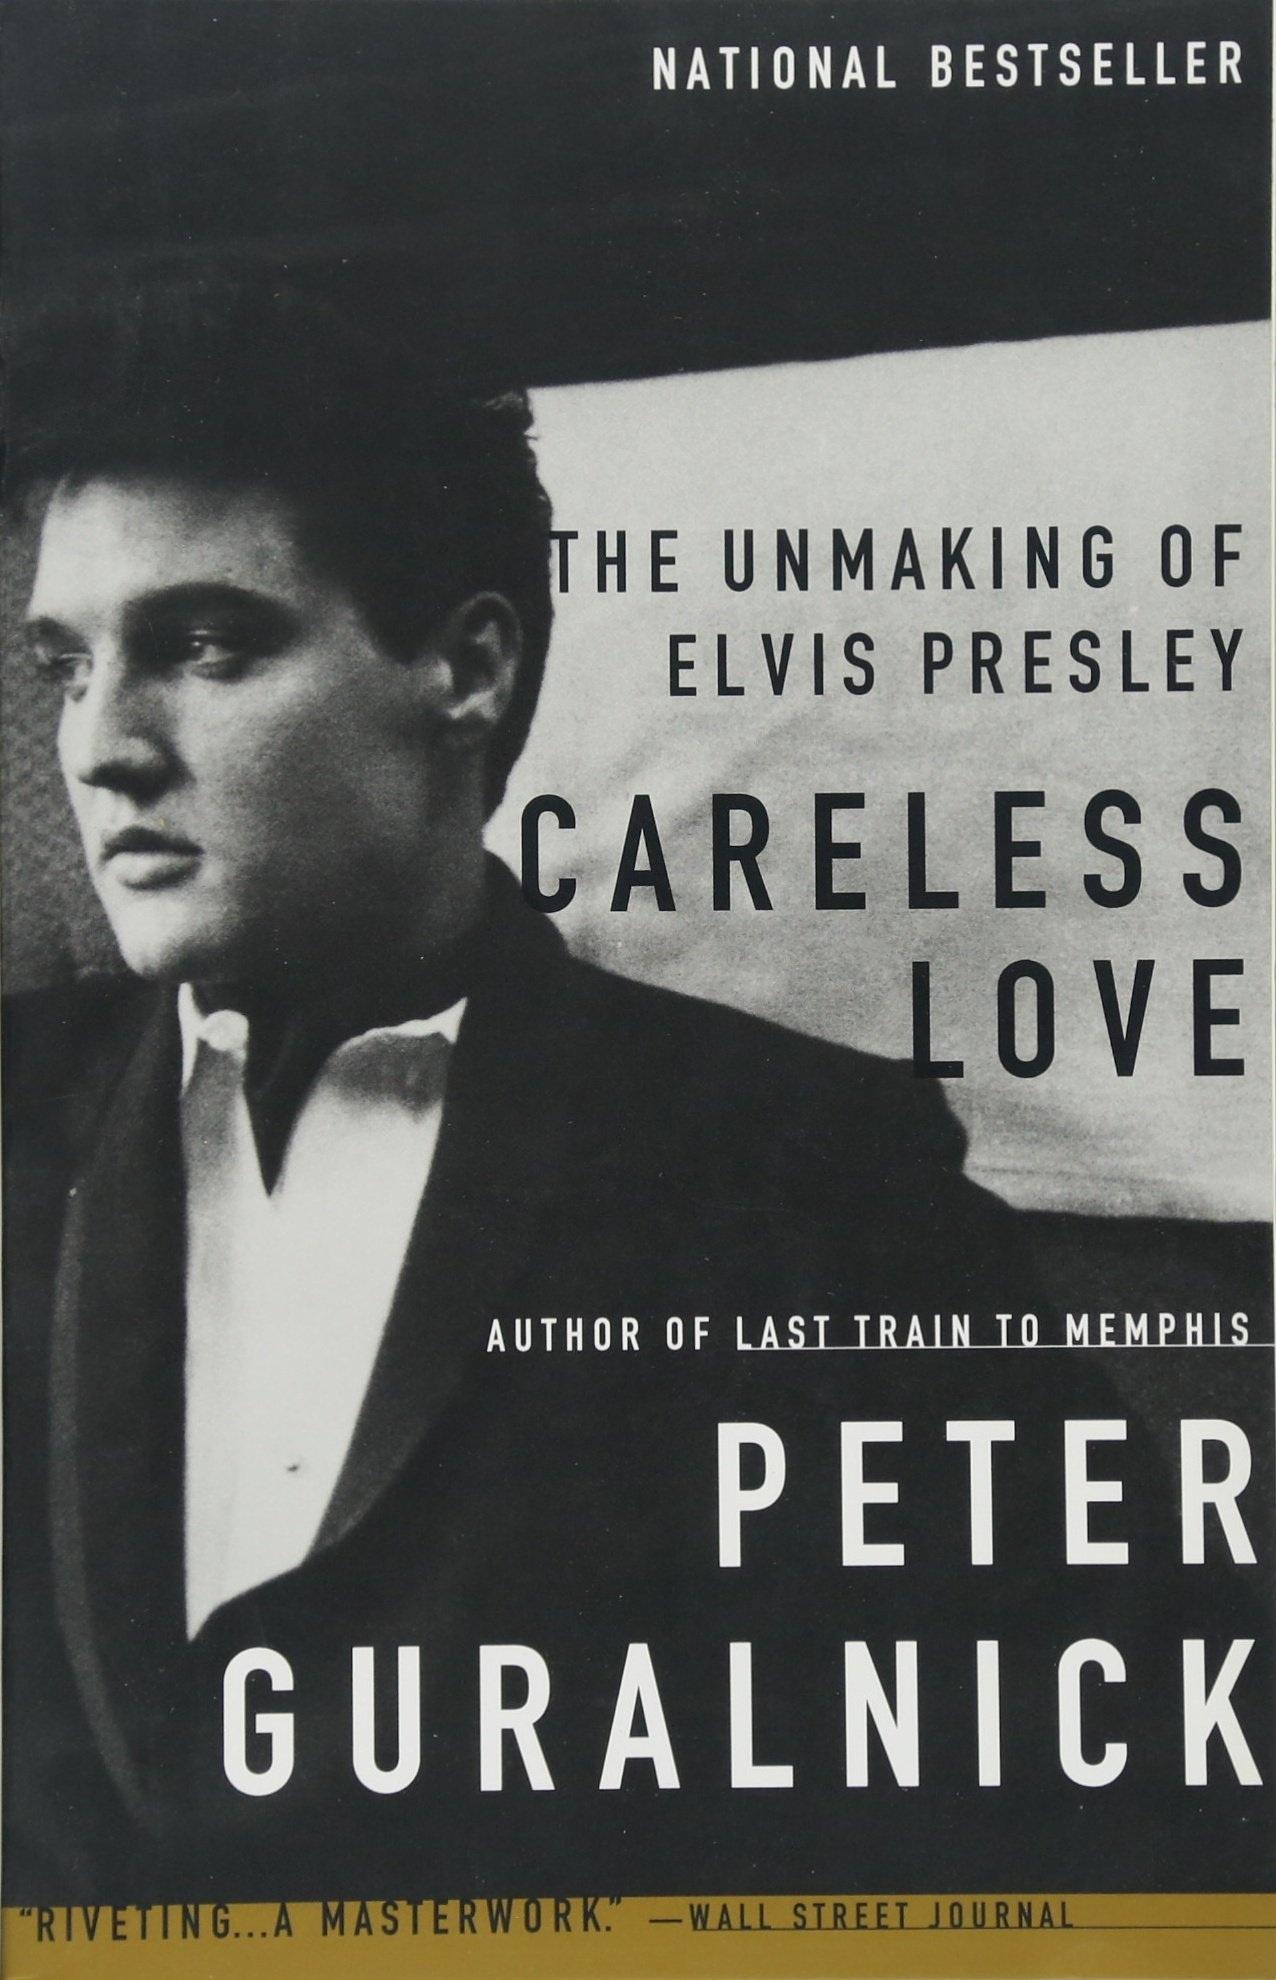 Peter Guralnick - Careless Love